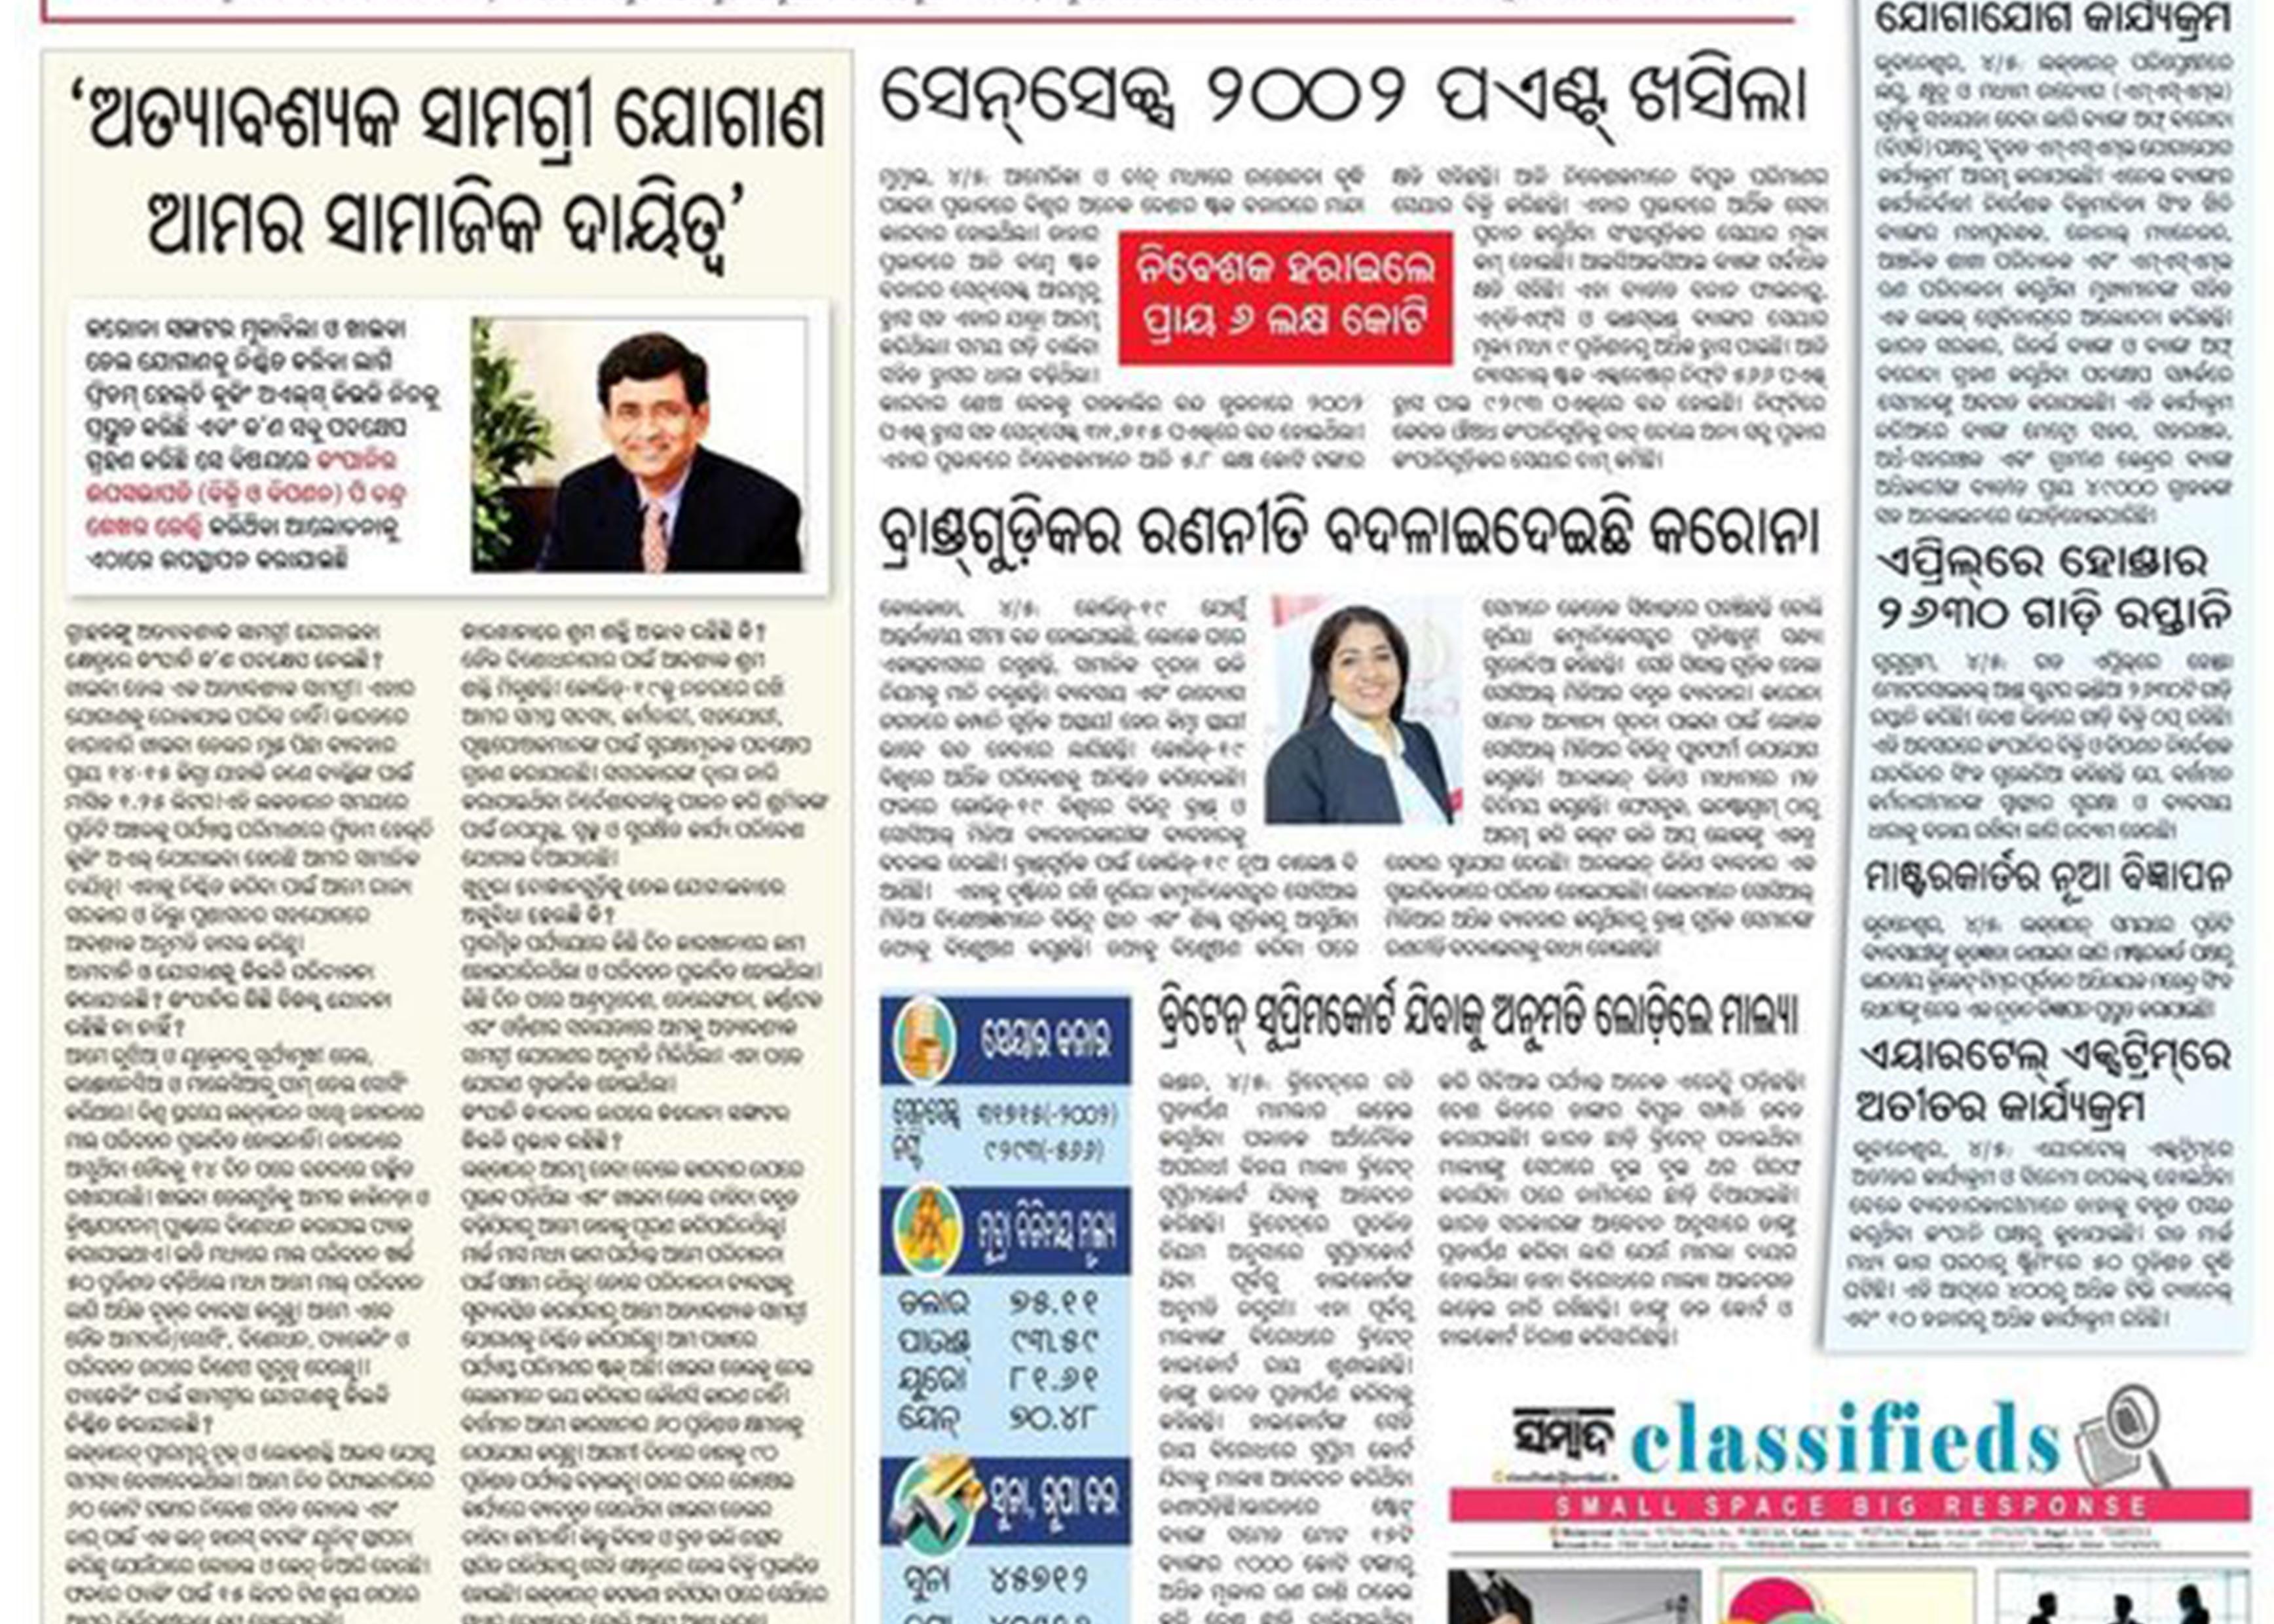 Coverage on Sambad, Odisha Daily